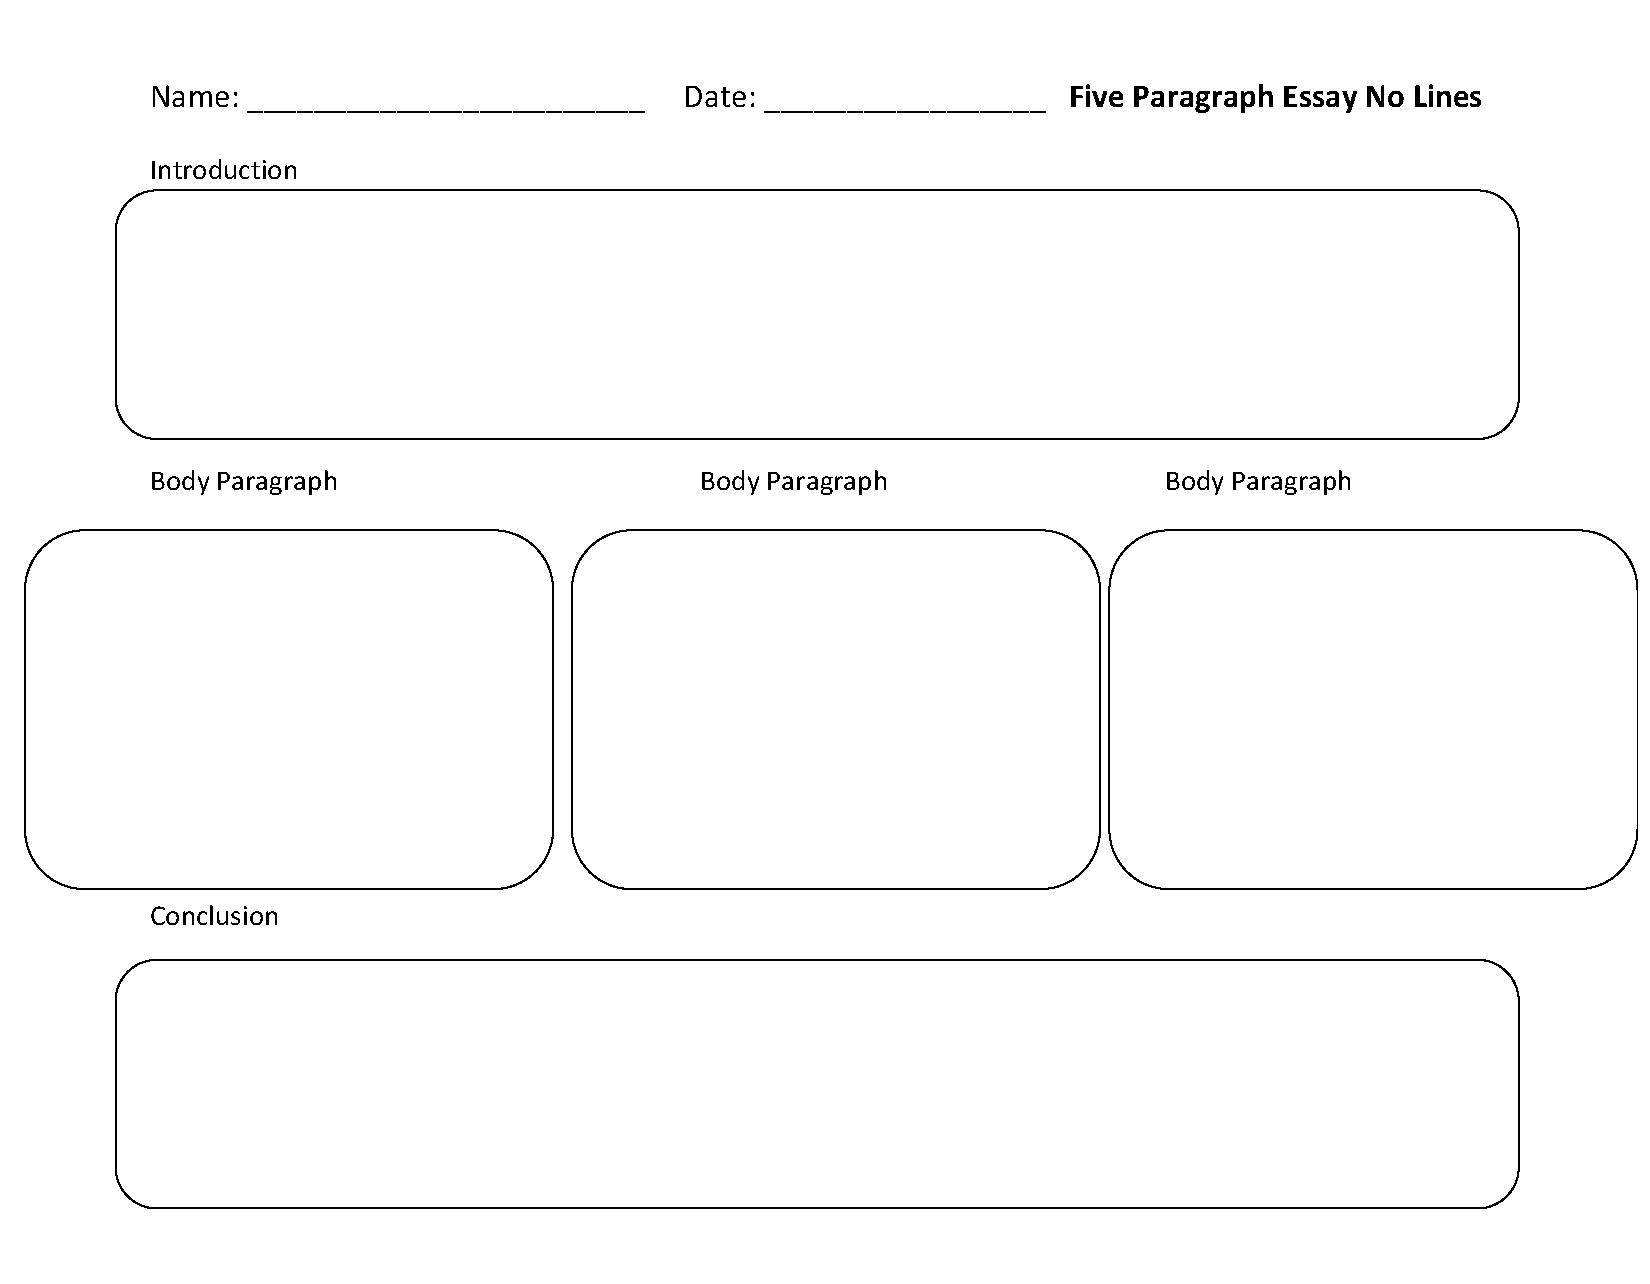 Free Worksheet Esl Writing Worksheets englishlinx com transitional words worksheets five paragraph essay no lines writing worksheets